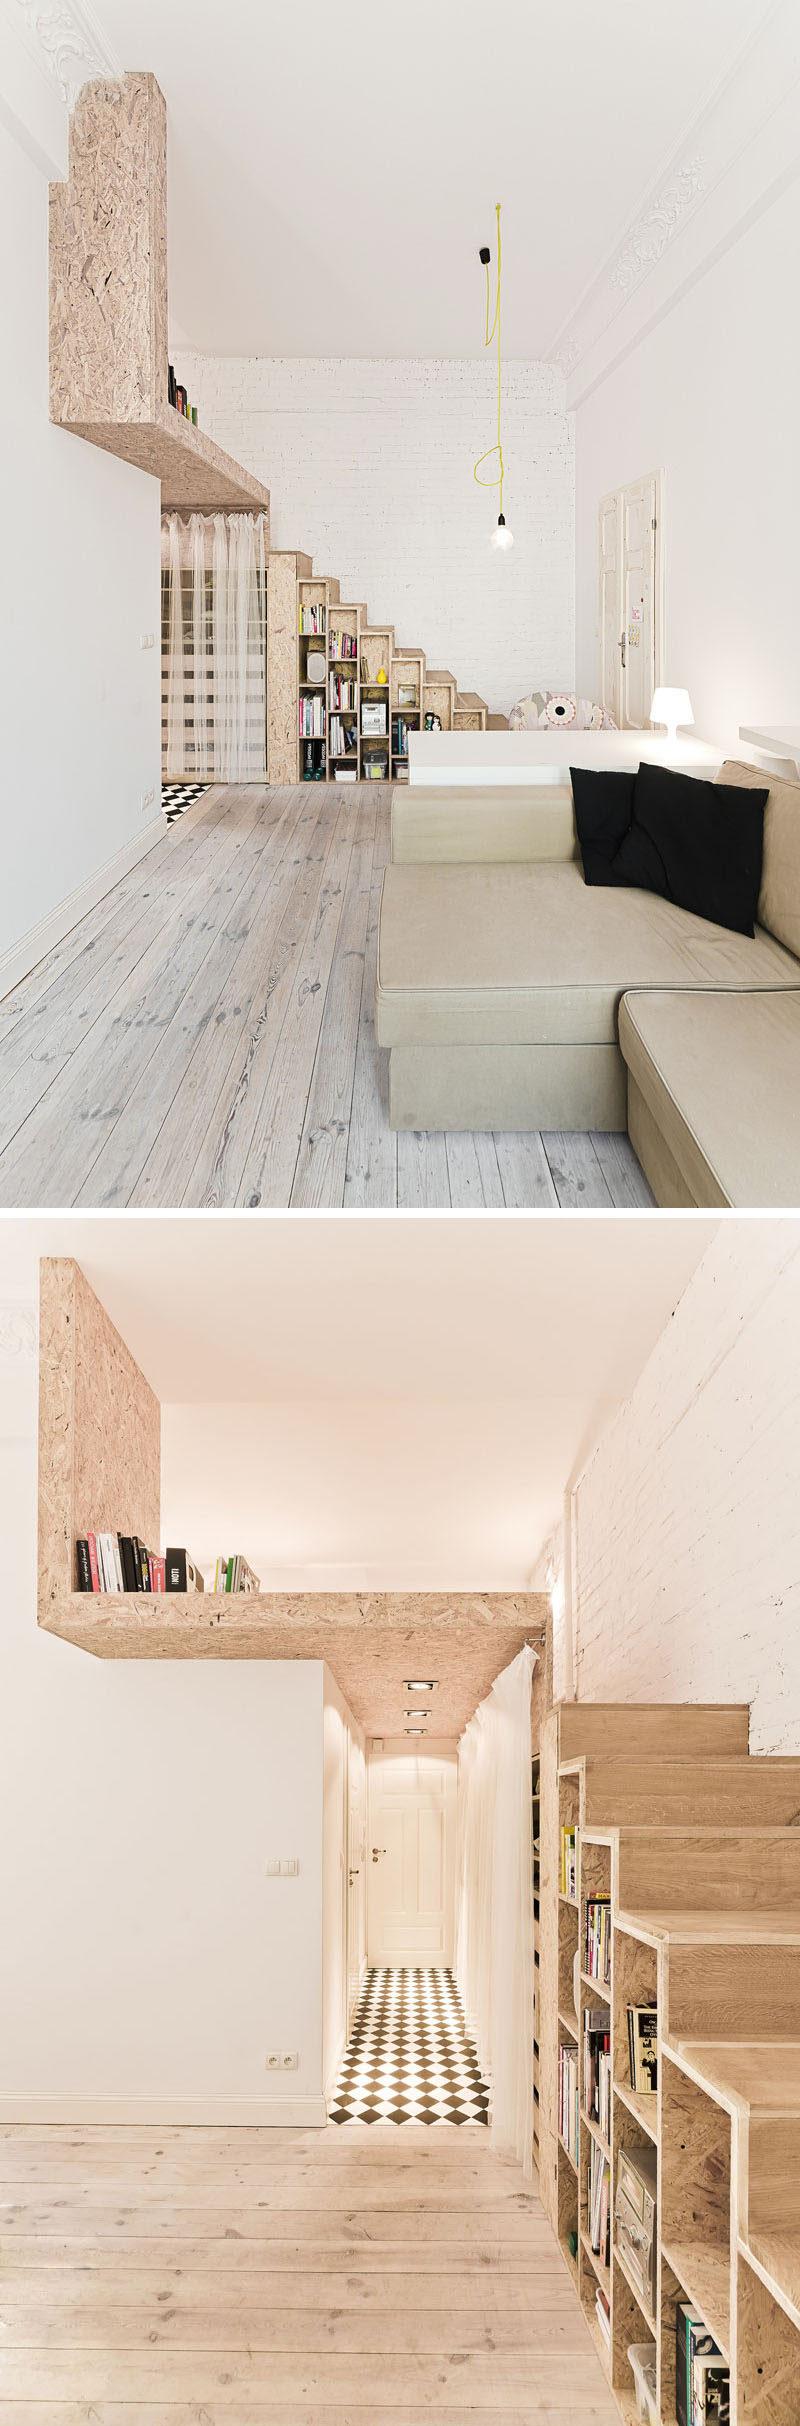 Wooden Bed Design With Storage